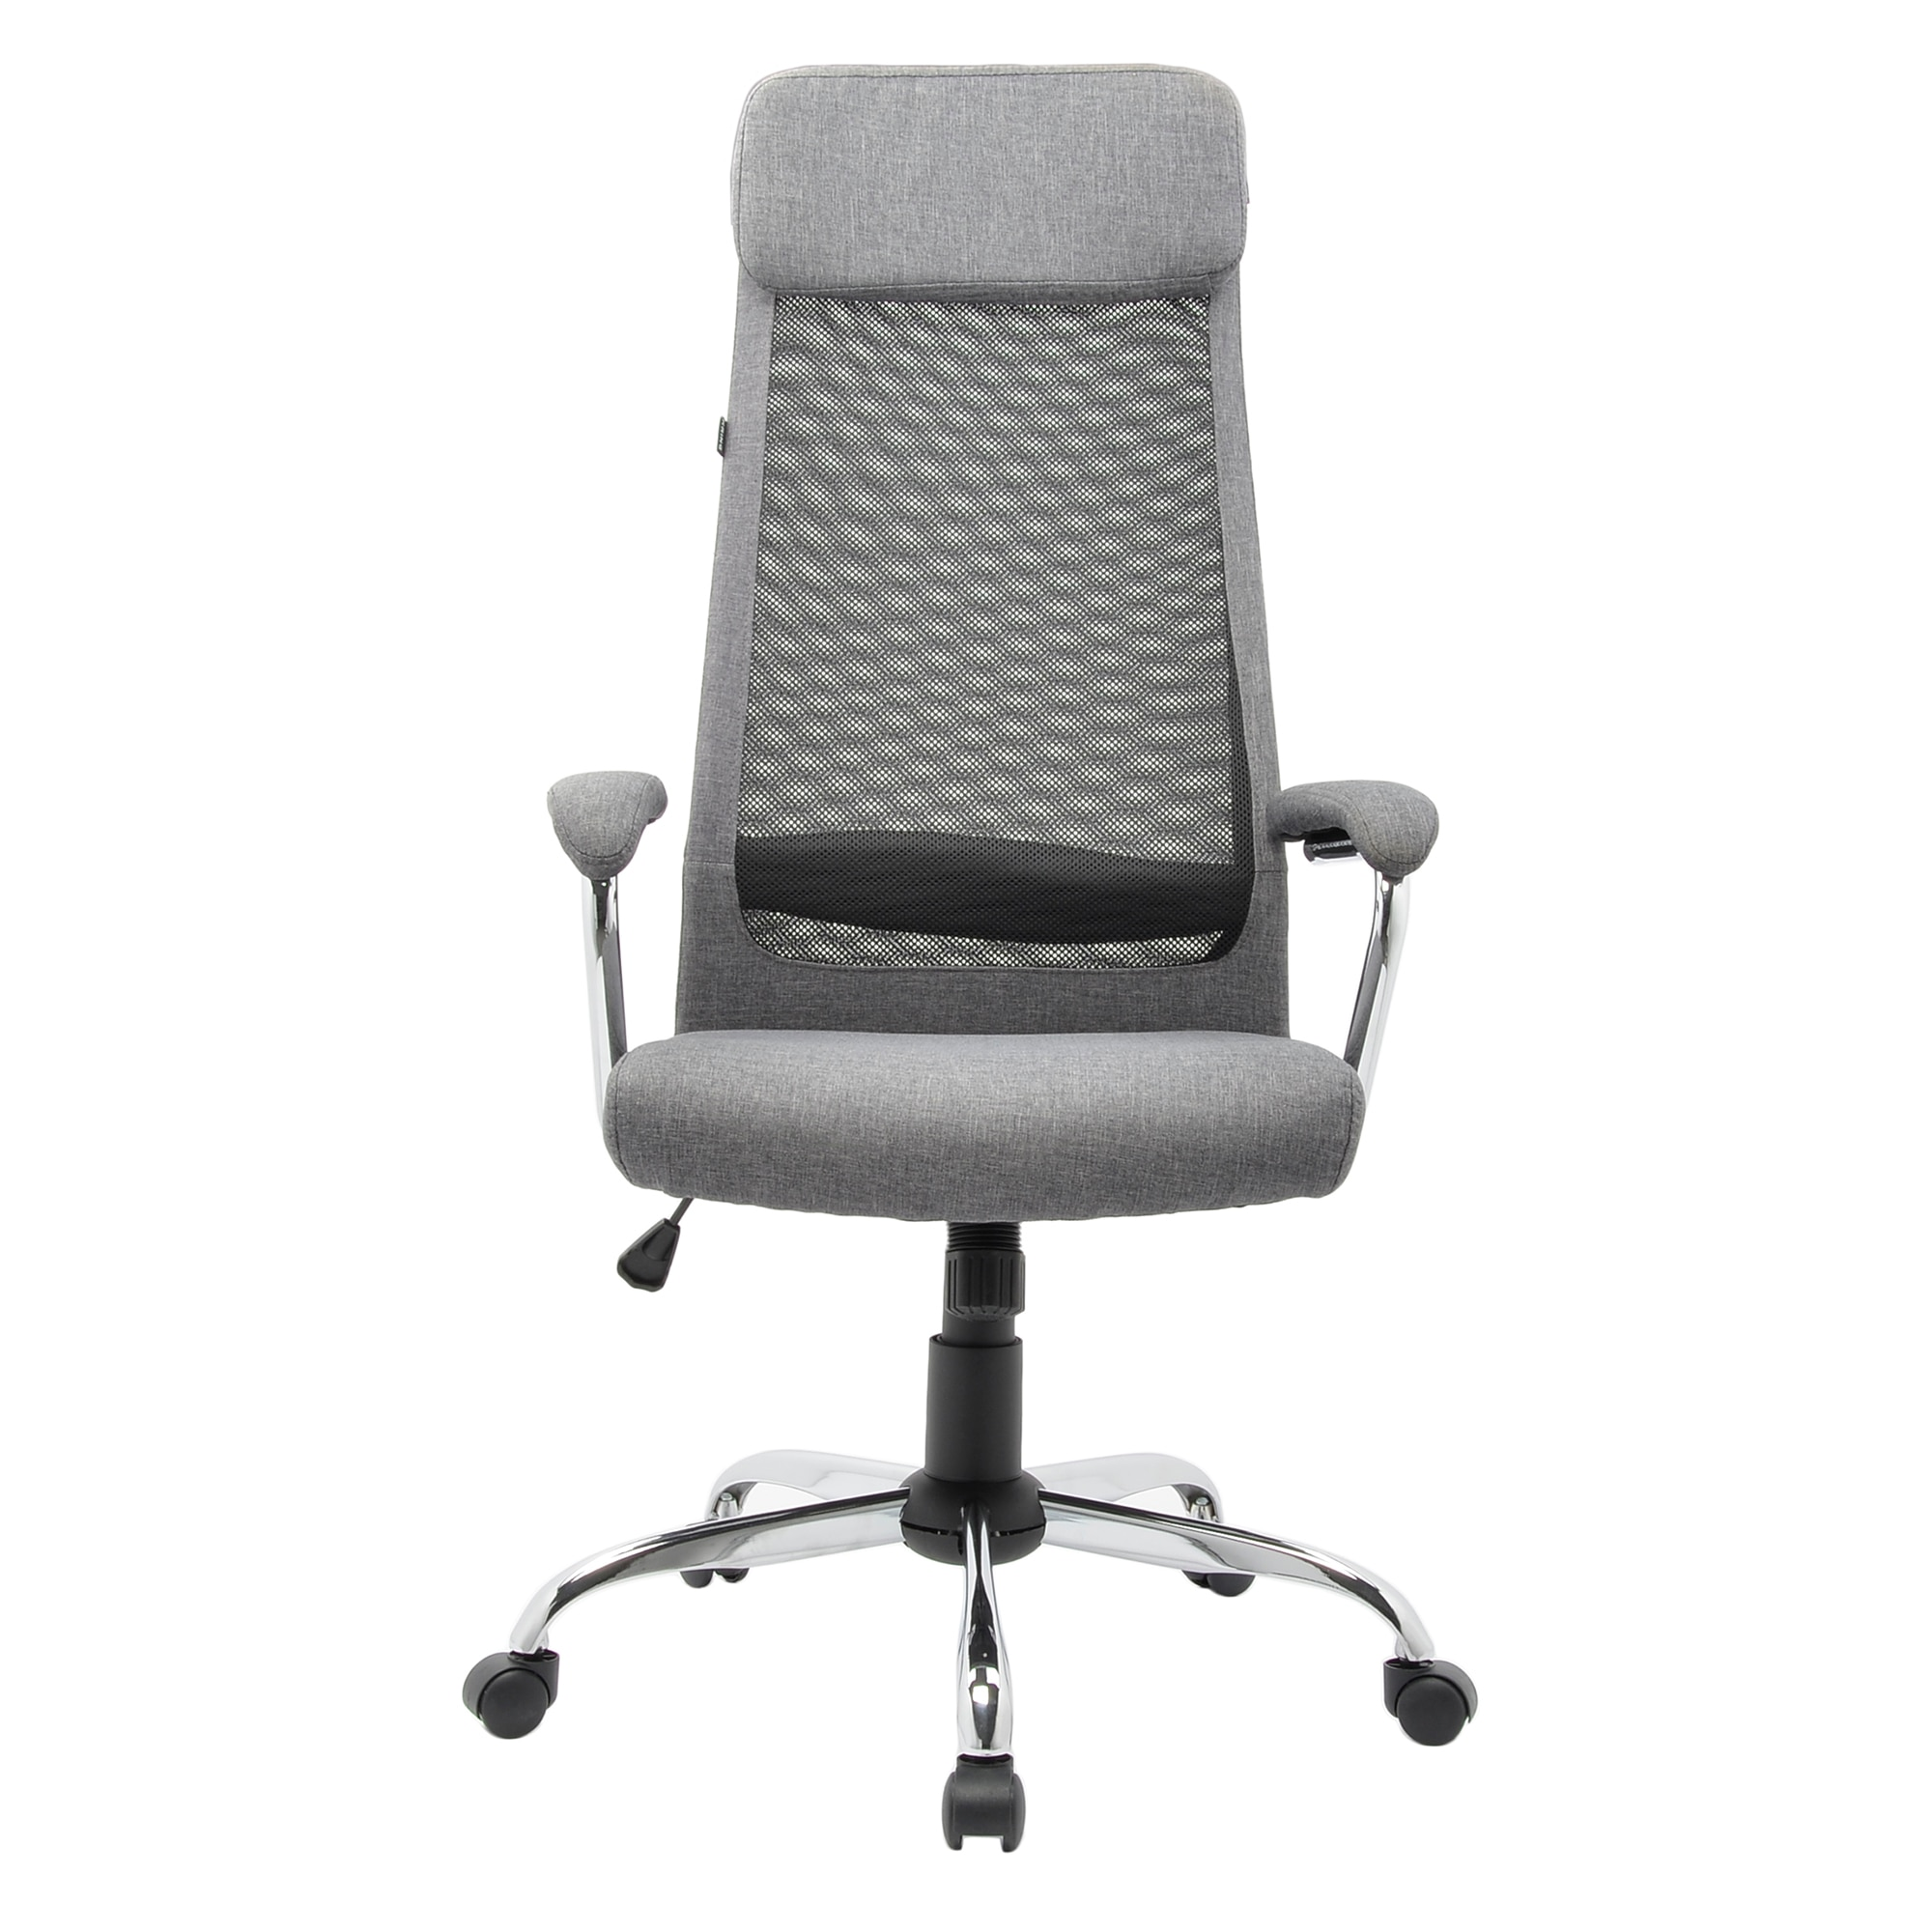 Kring Klaus X ergonómikus irodai szék, Szürke eMAG.hu